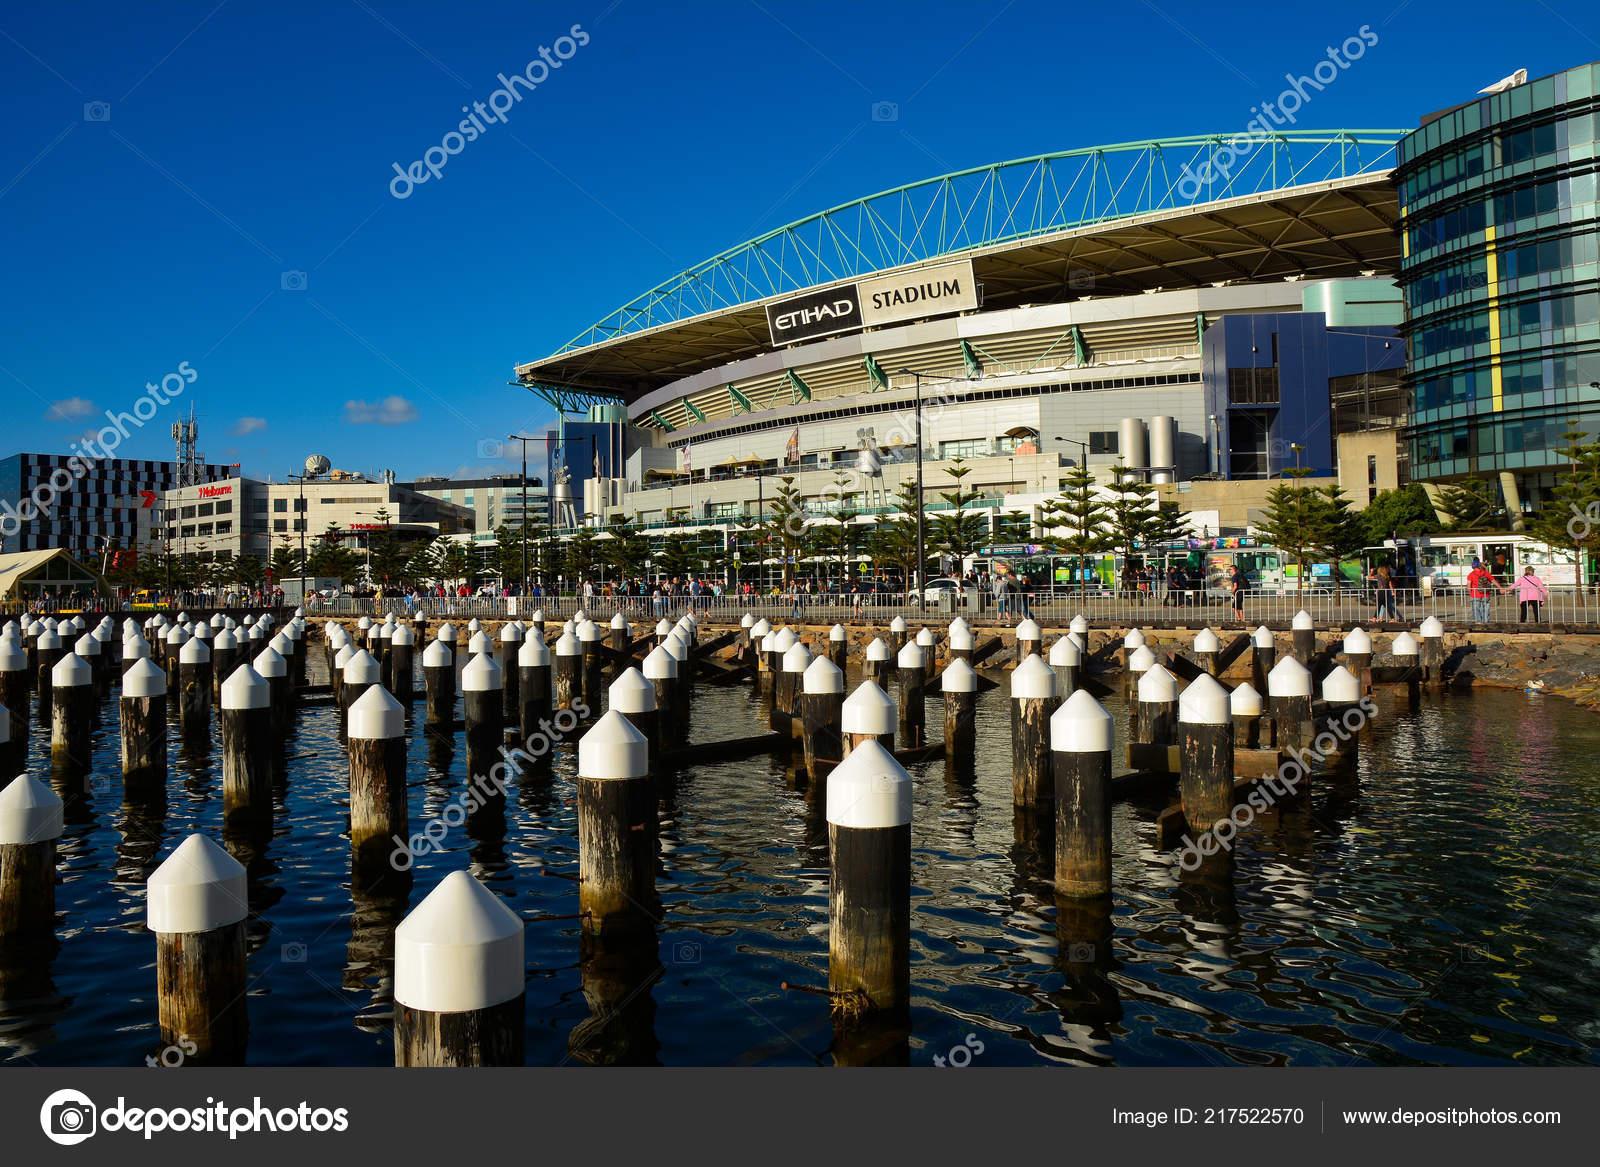 Etihad Stadium Docklands Melbourne Australia Venue Sport Entertainment  Events – Stock Editorial Photo © momo11353@hotmail.com #217522570